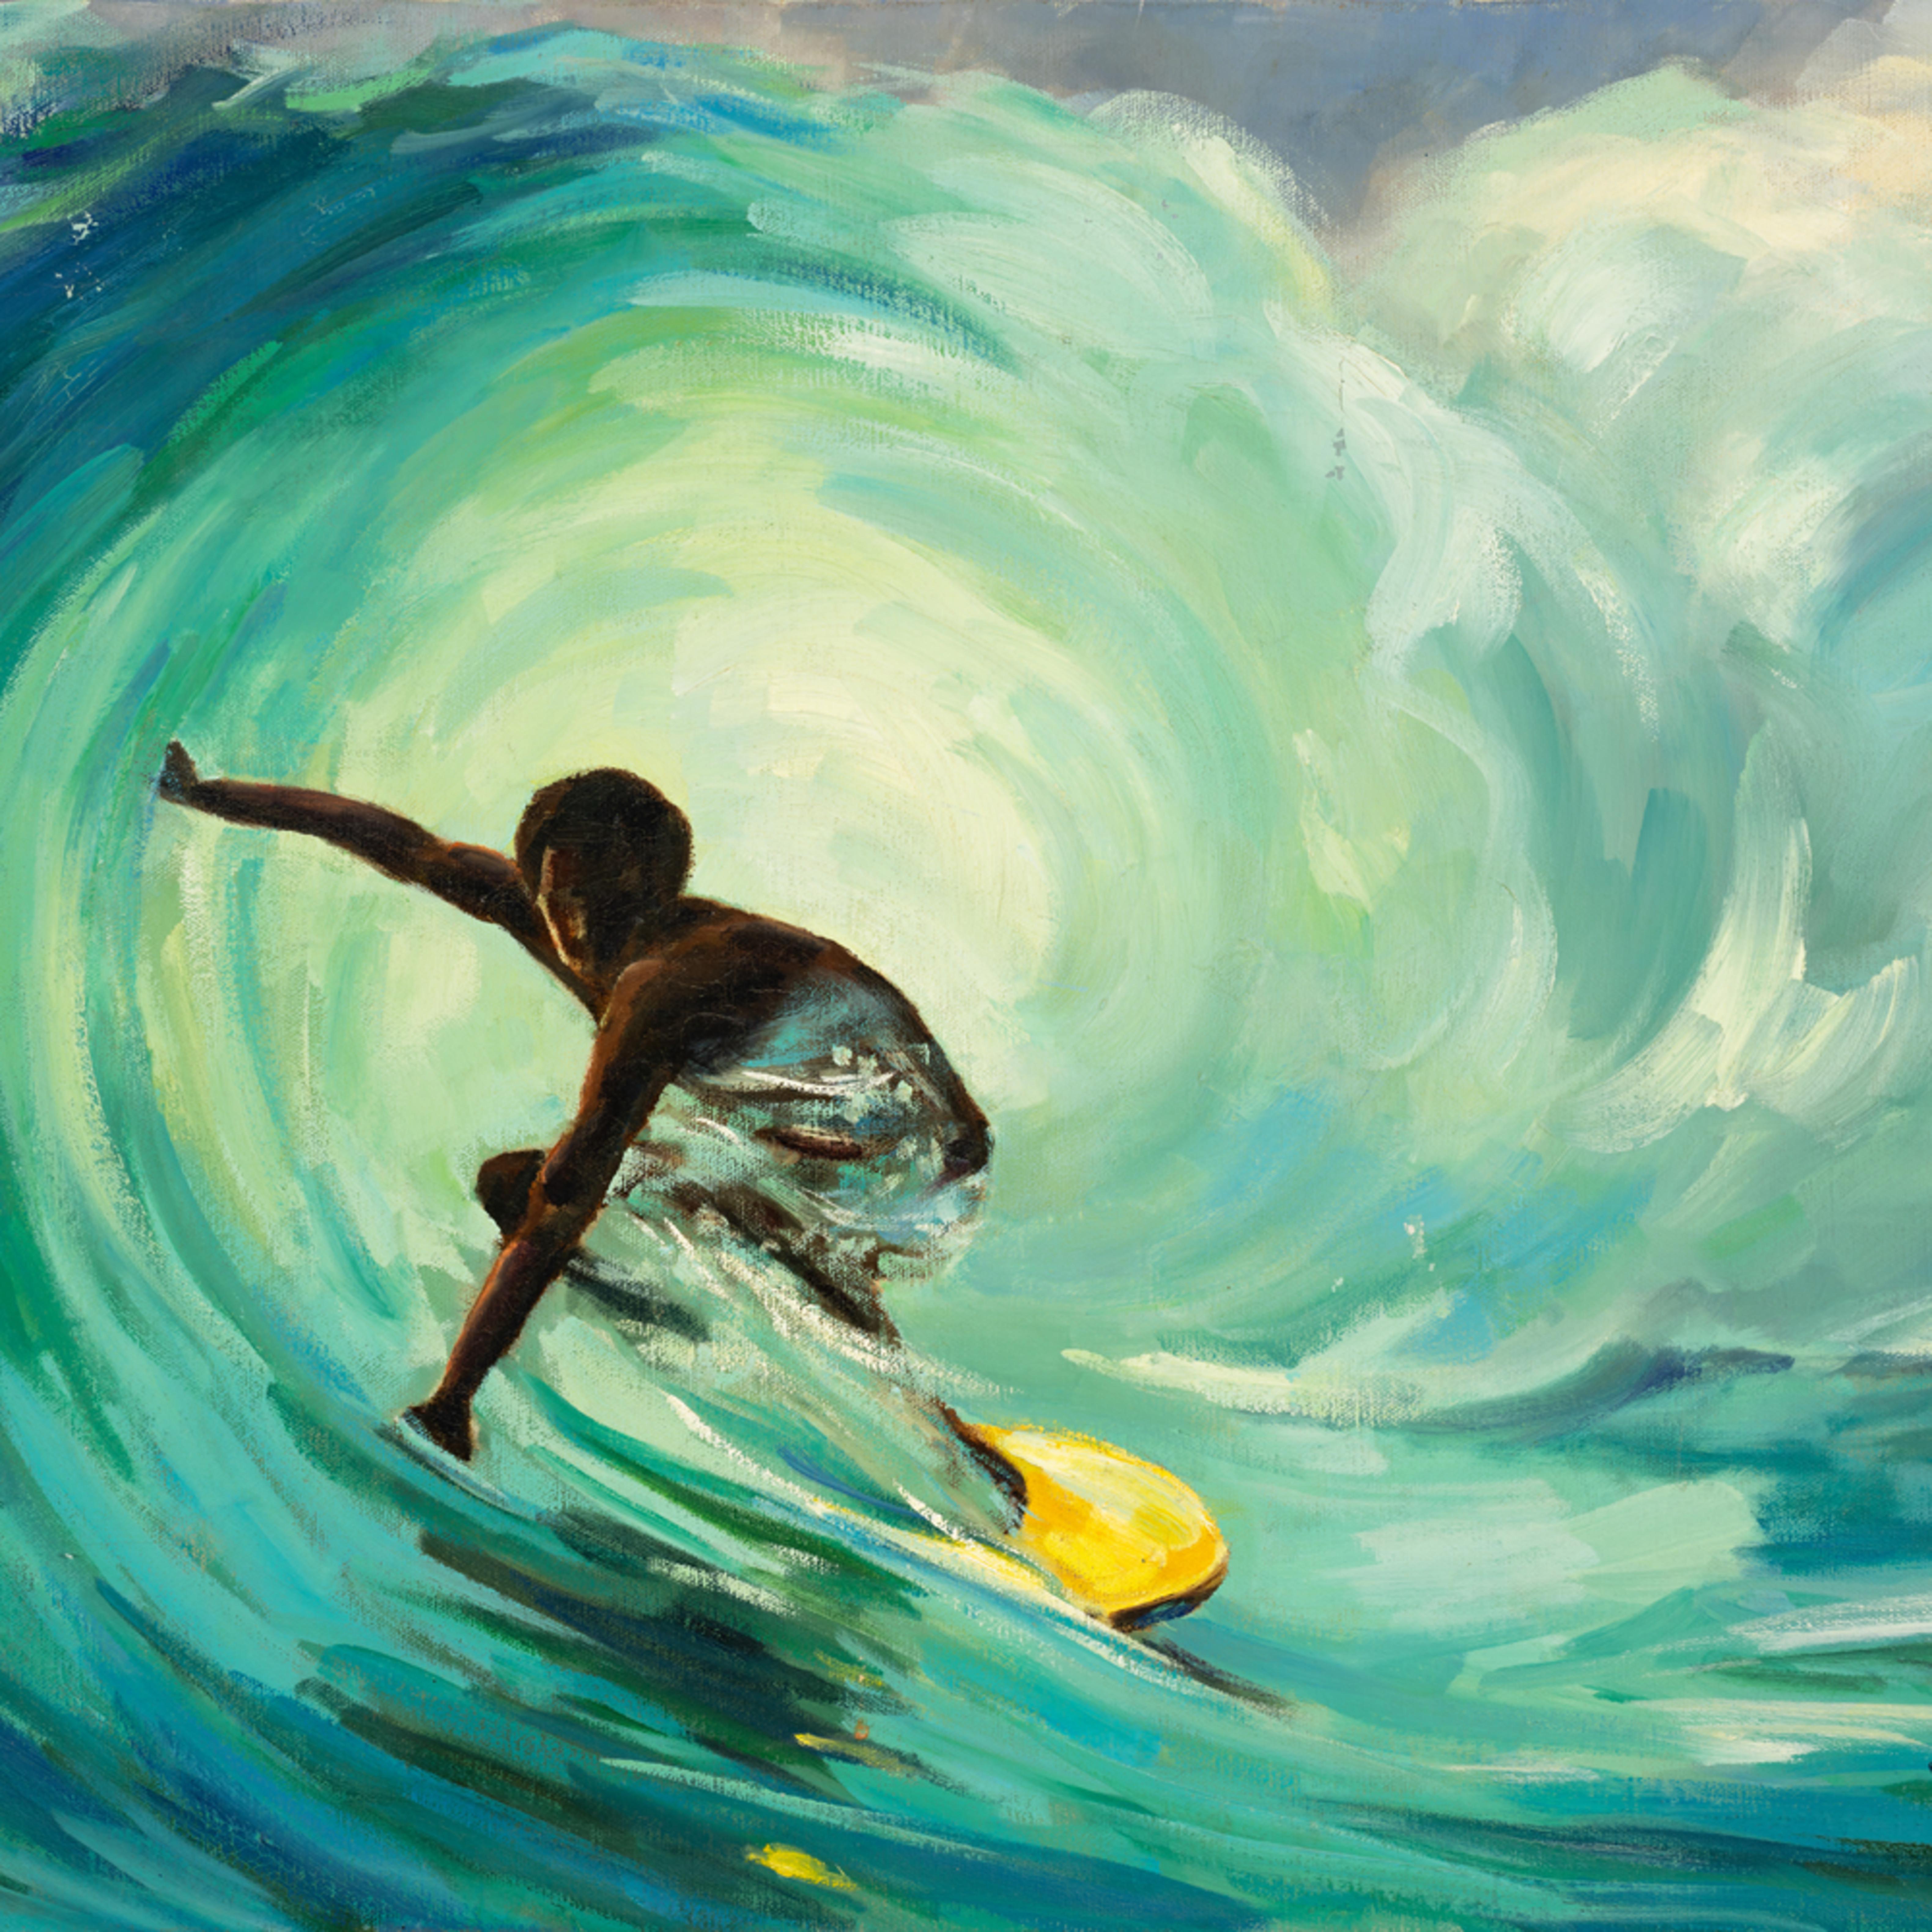 Surfer jpeg vg4avk